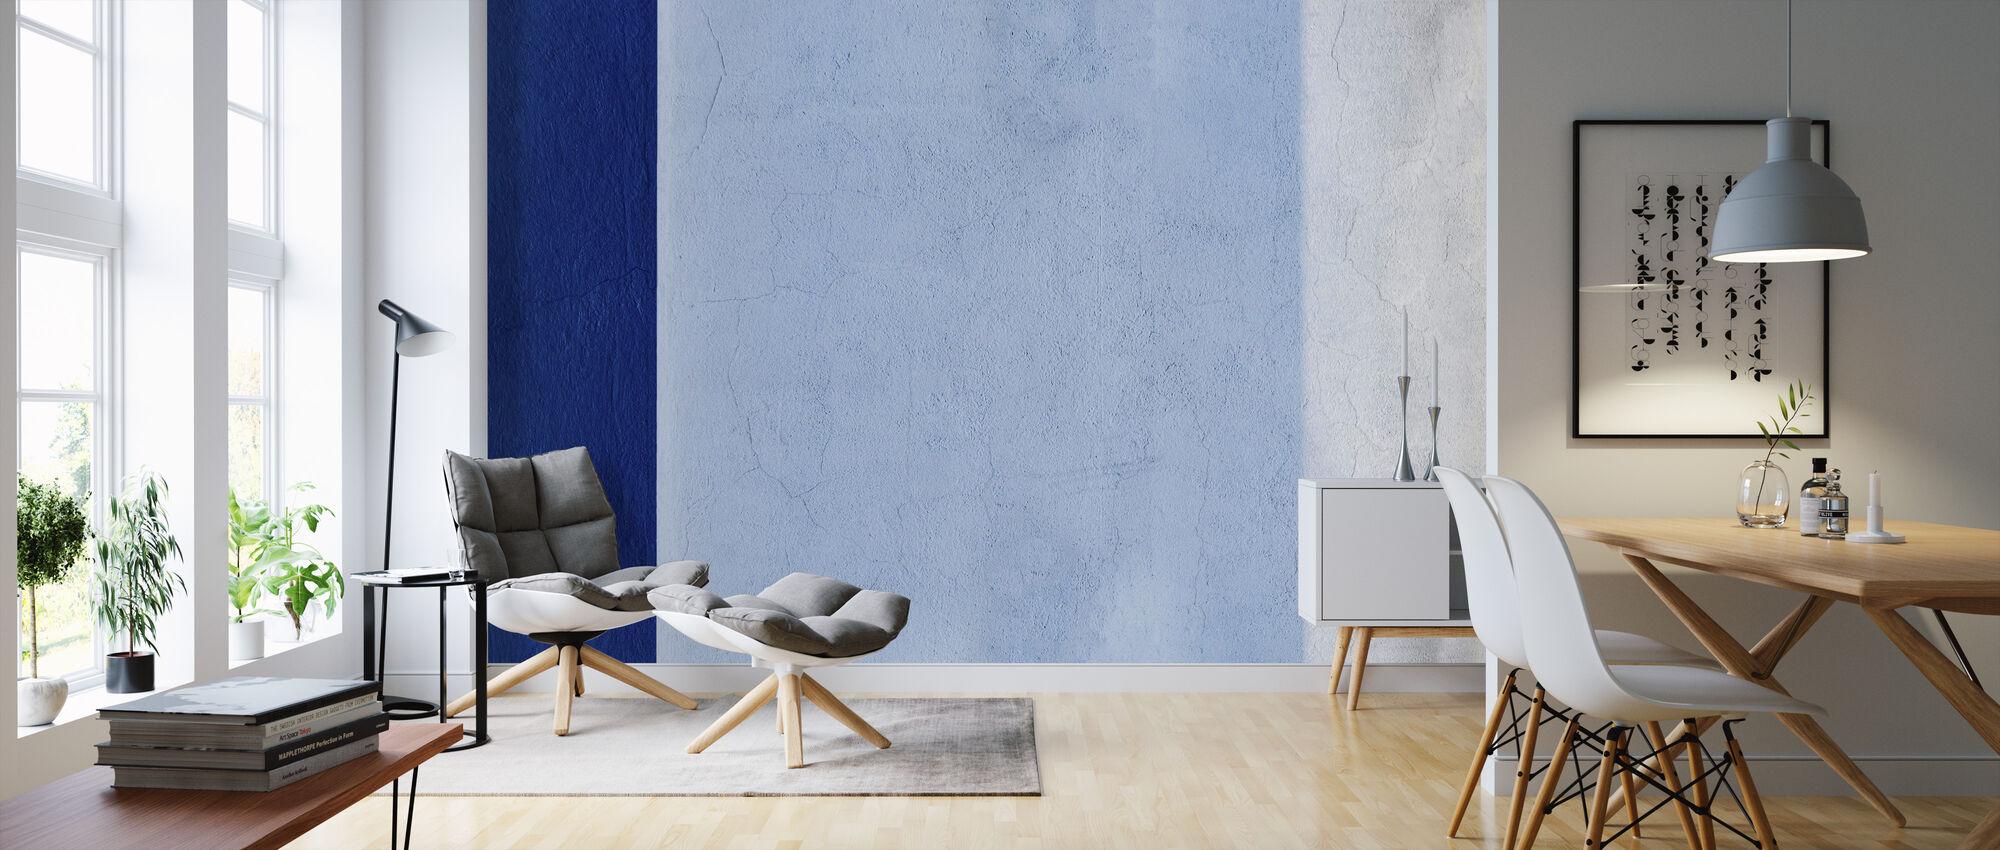 Blue Wall - Wallpaper - Living Room